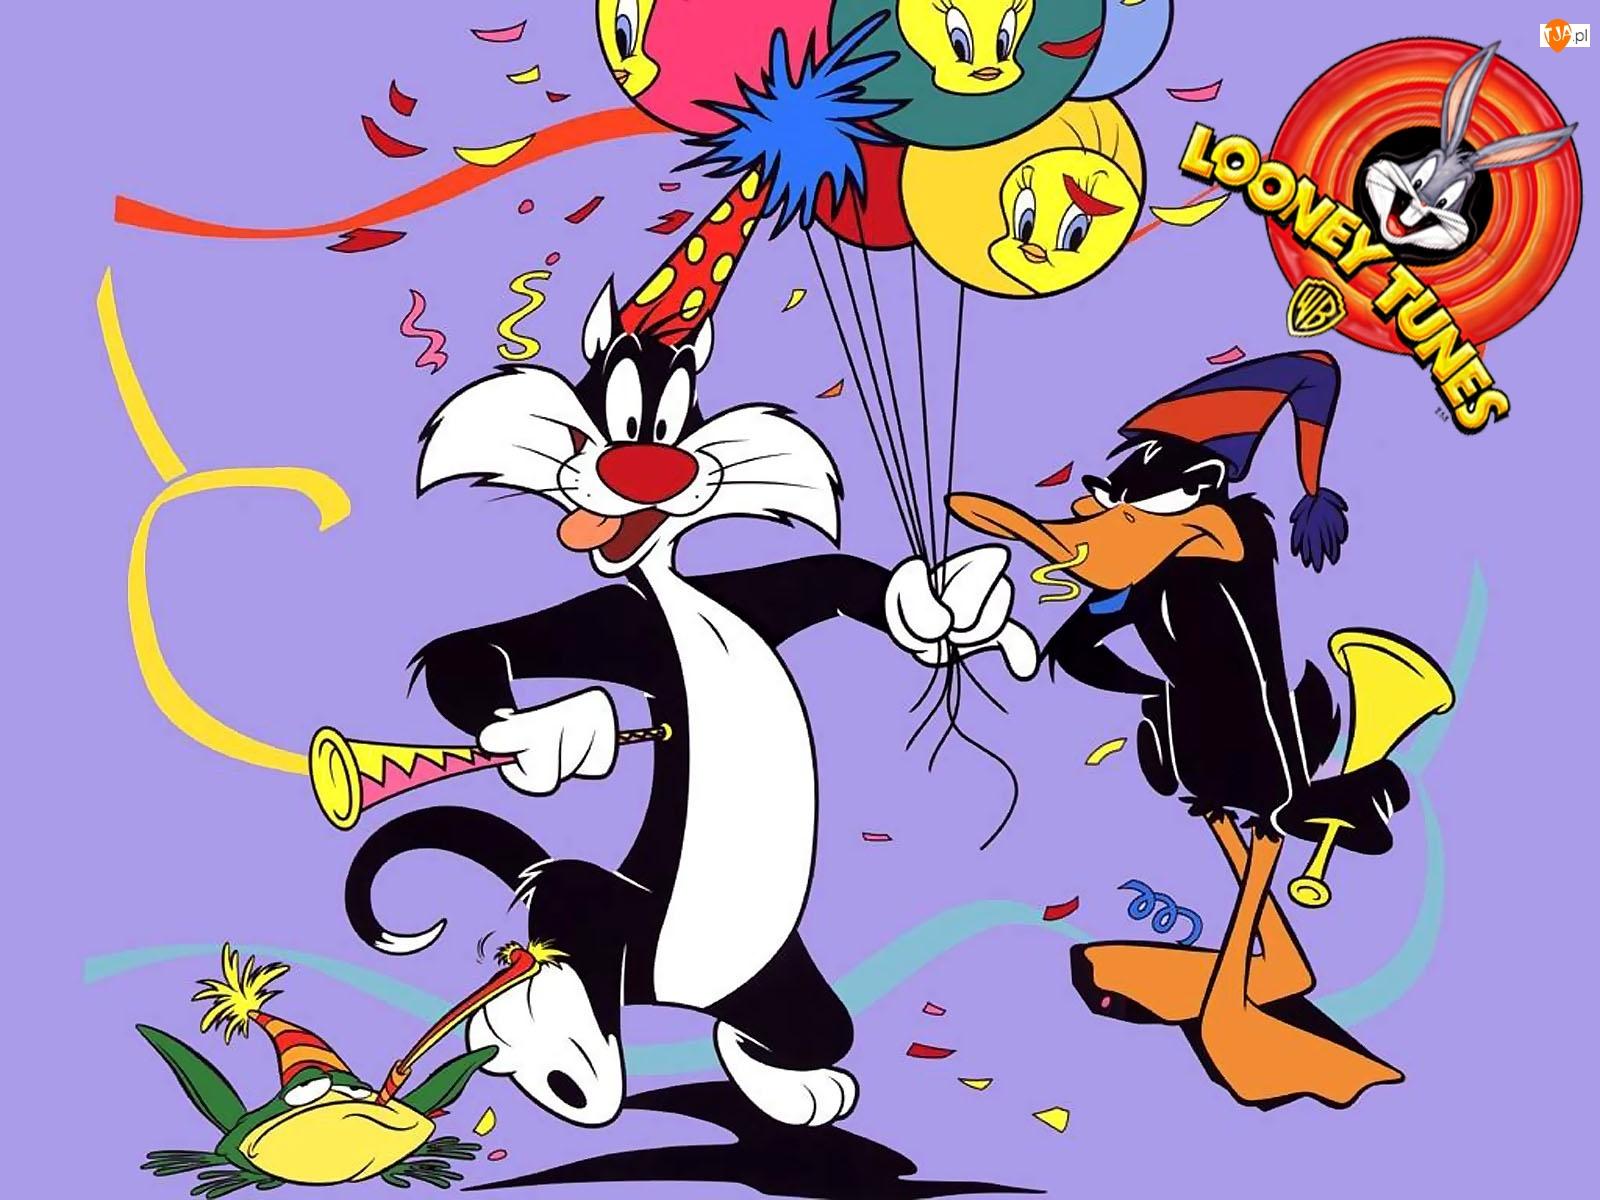 Impreza, Looney Tunes, Baloniki